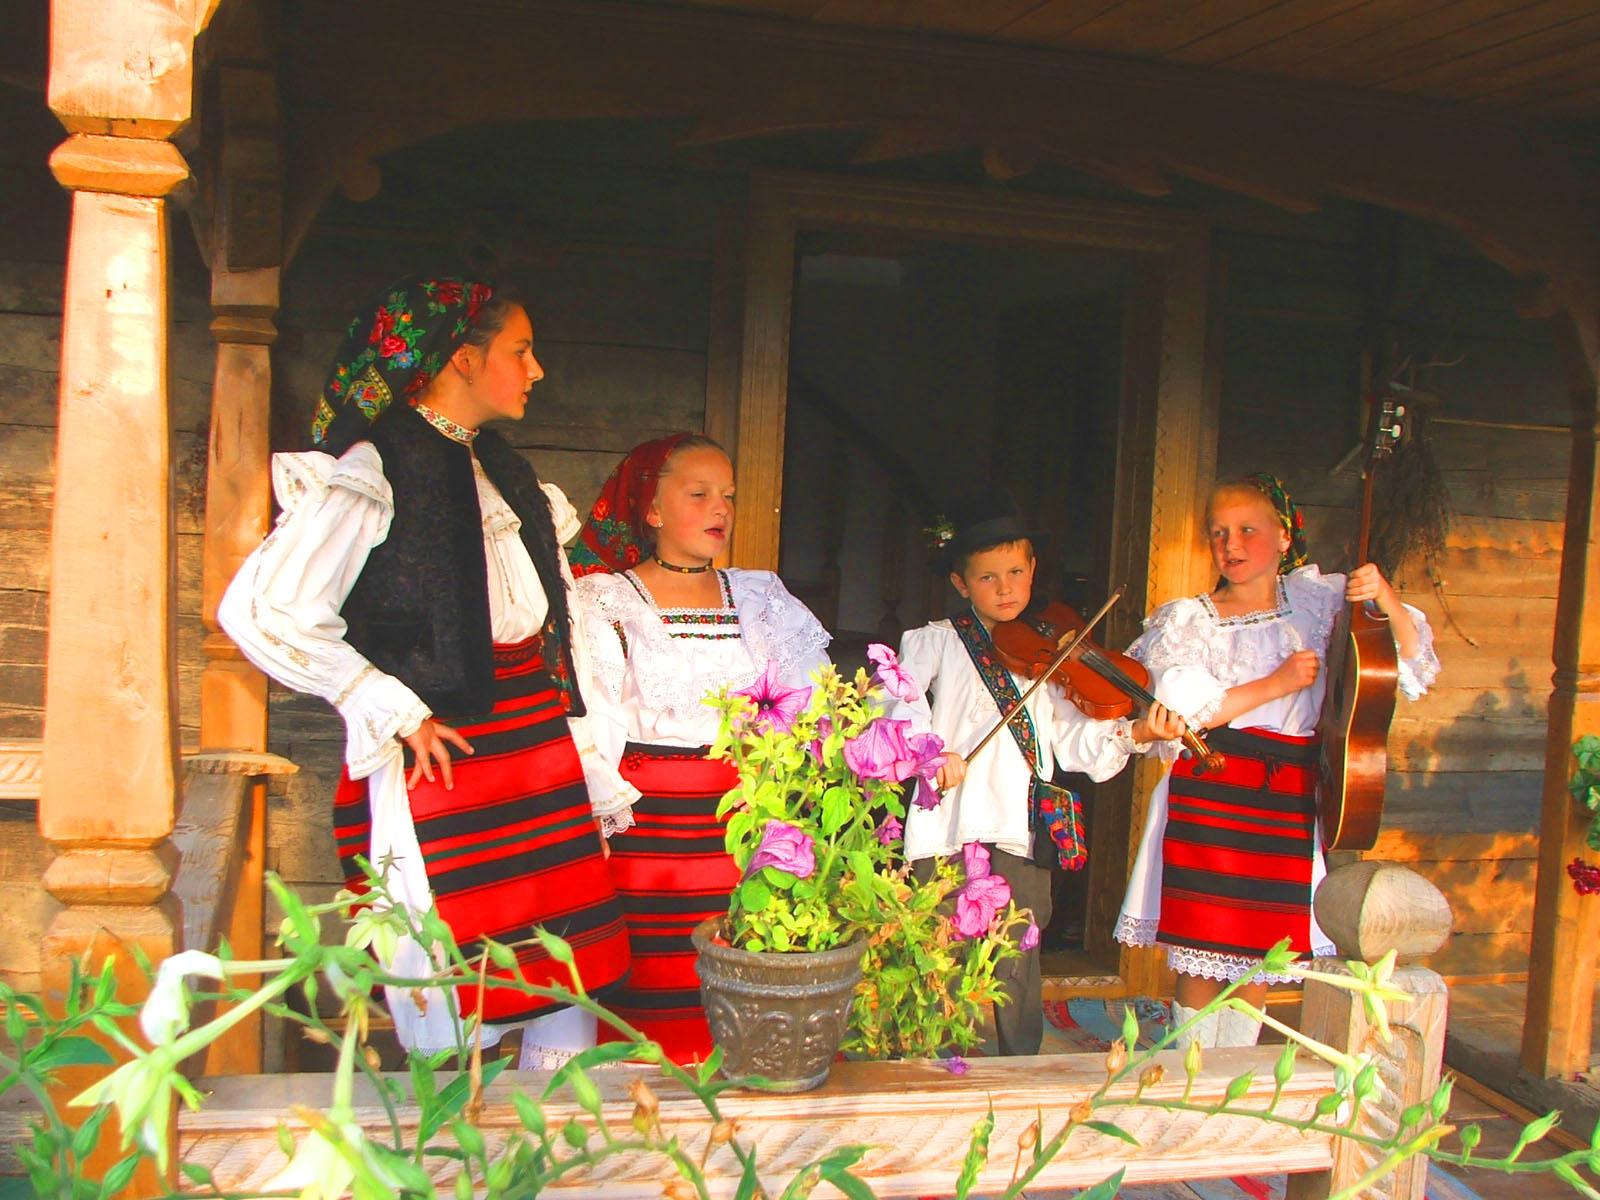 România – o fotografie şi o poveste (4)